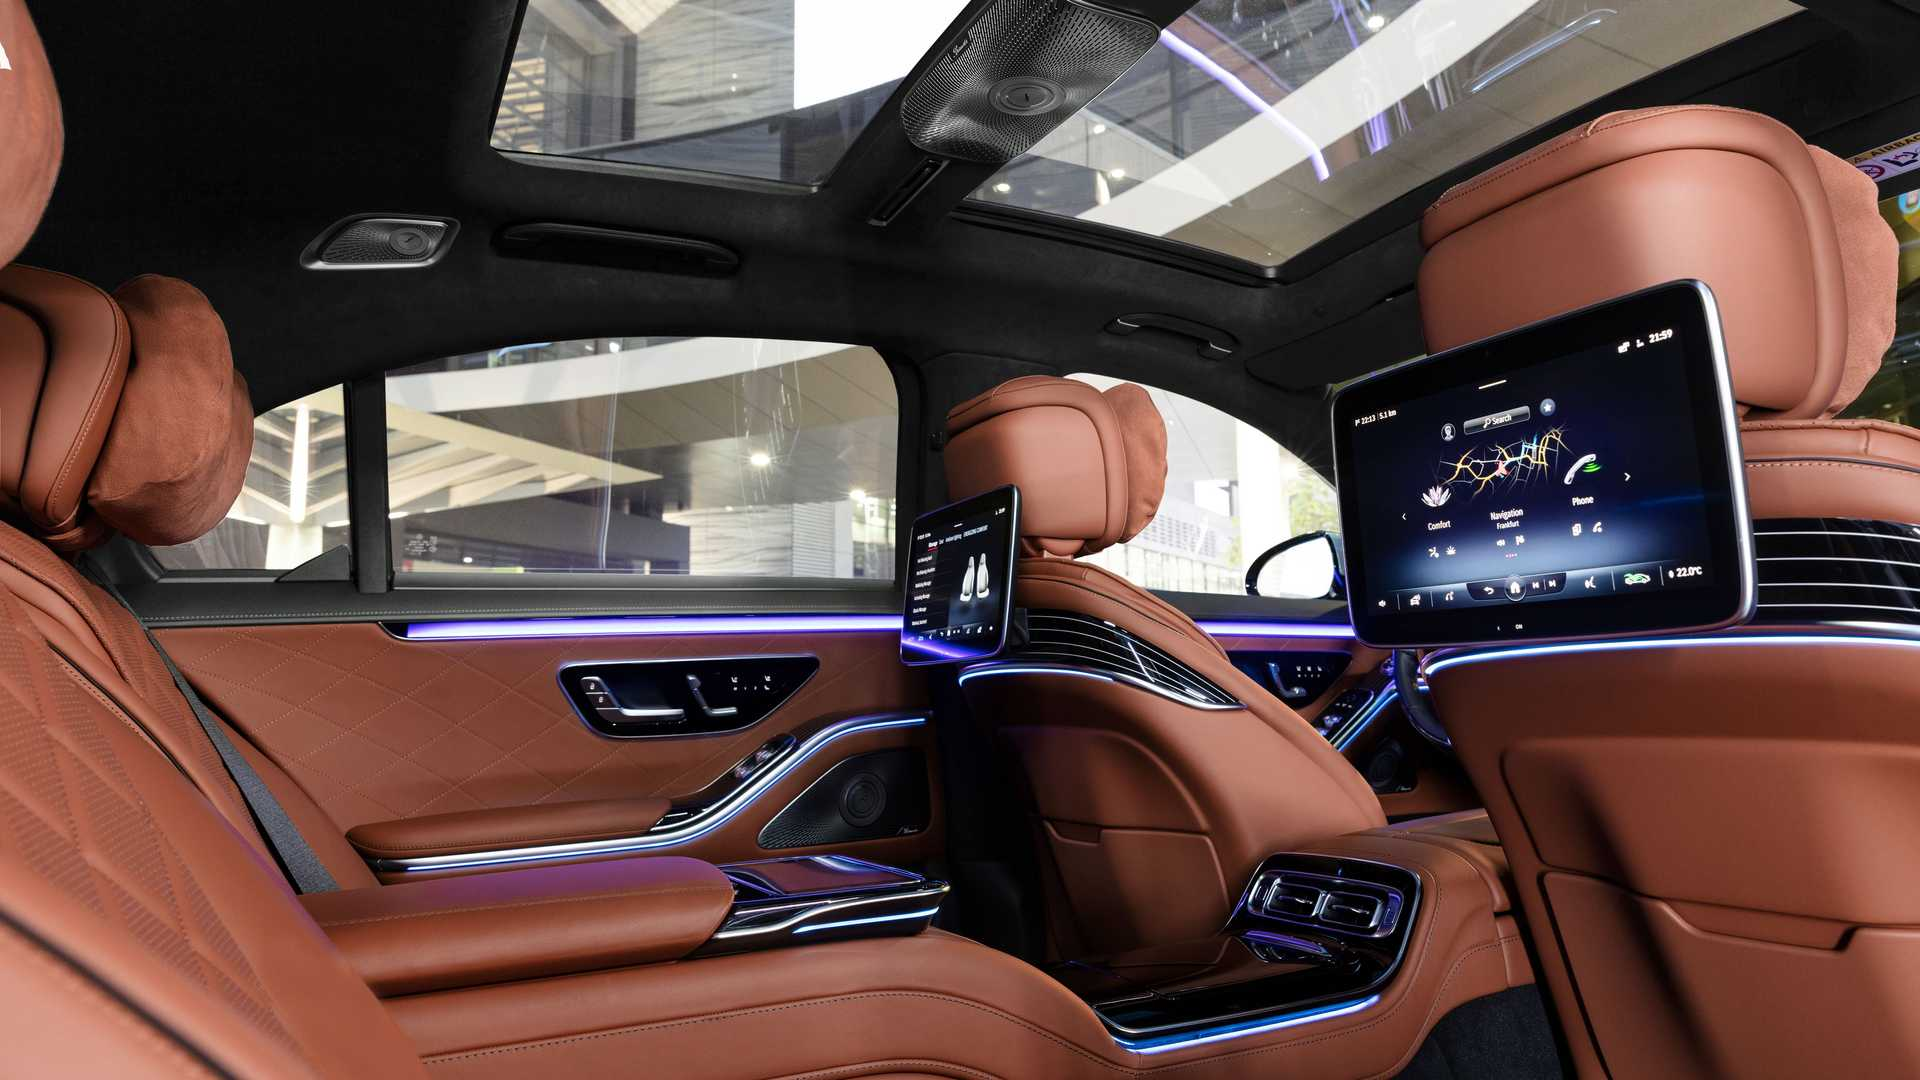 2021-mercedes-benz-s-class-interior (2)